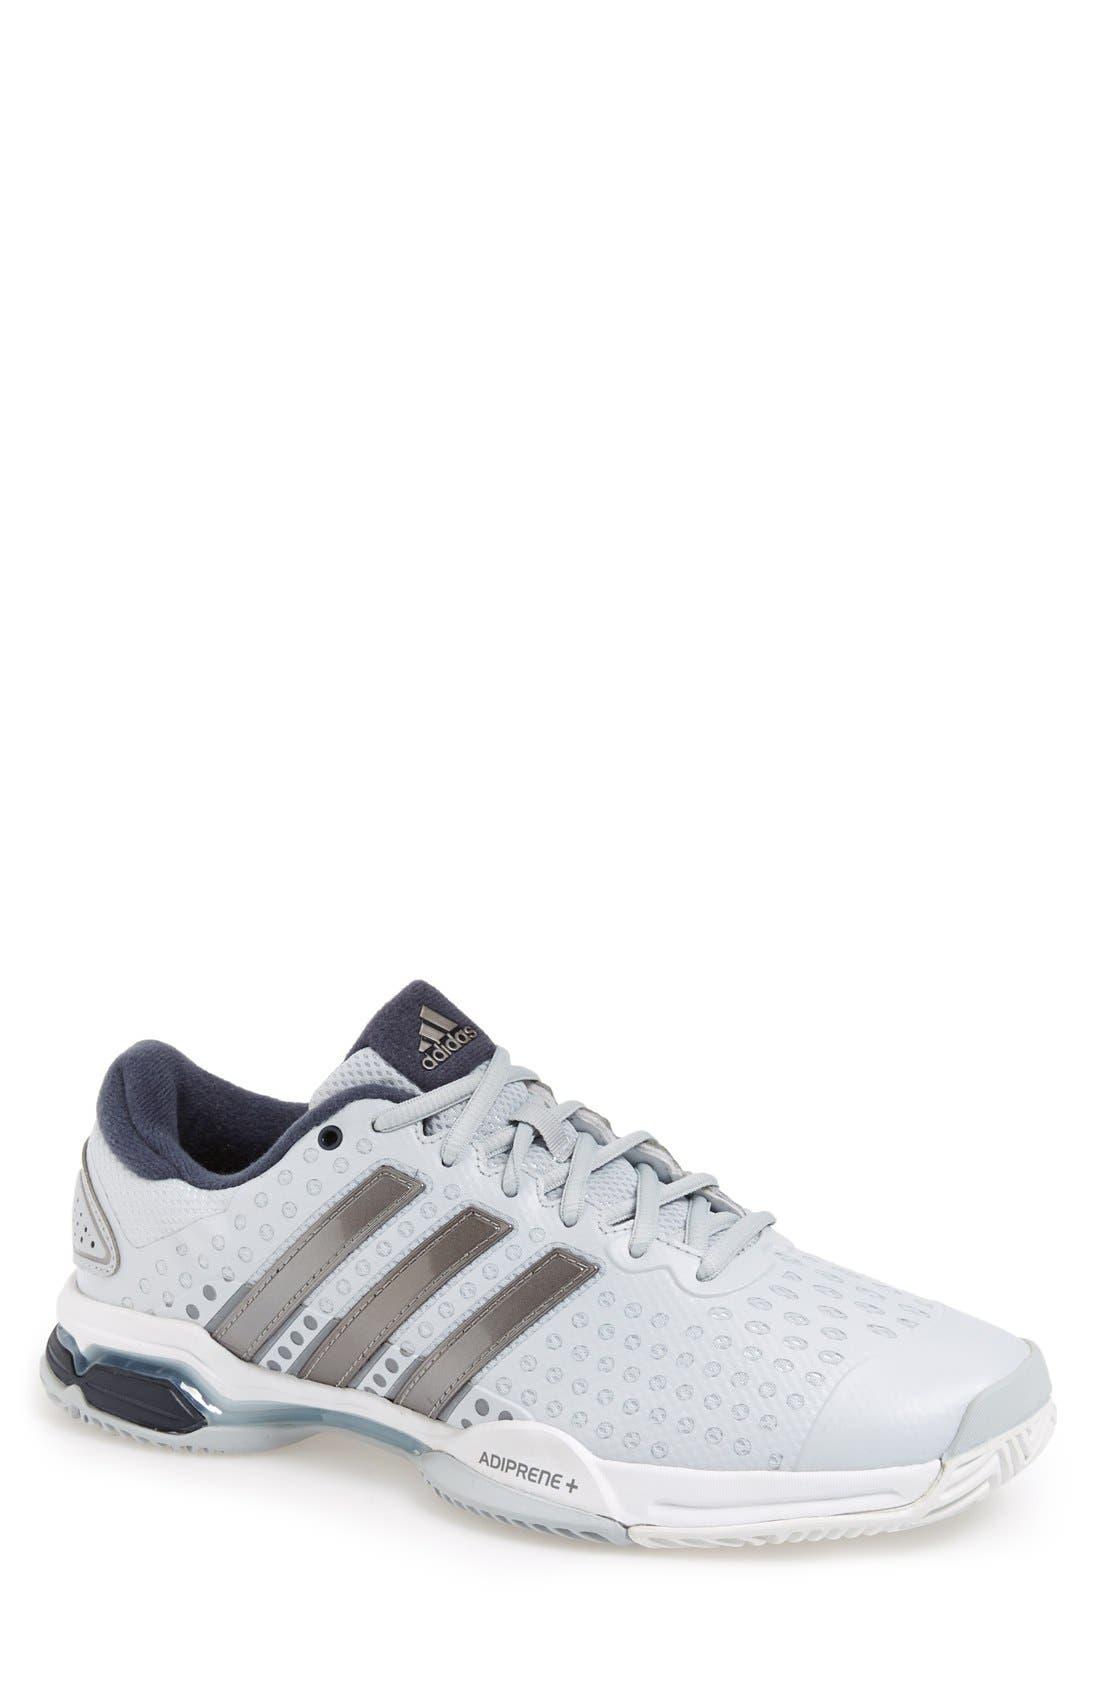 adidas 'Barricade Team 4' Tennis Shoe